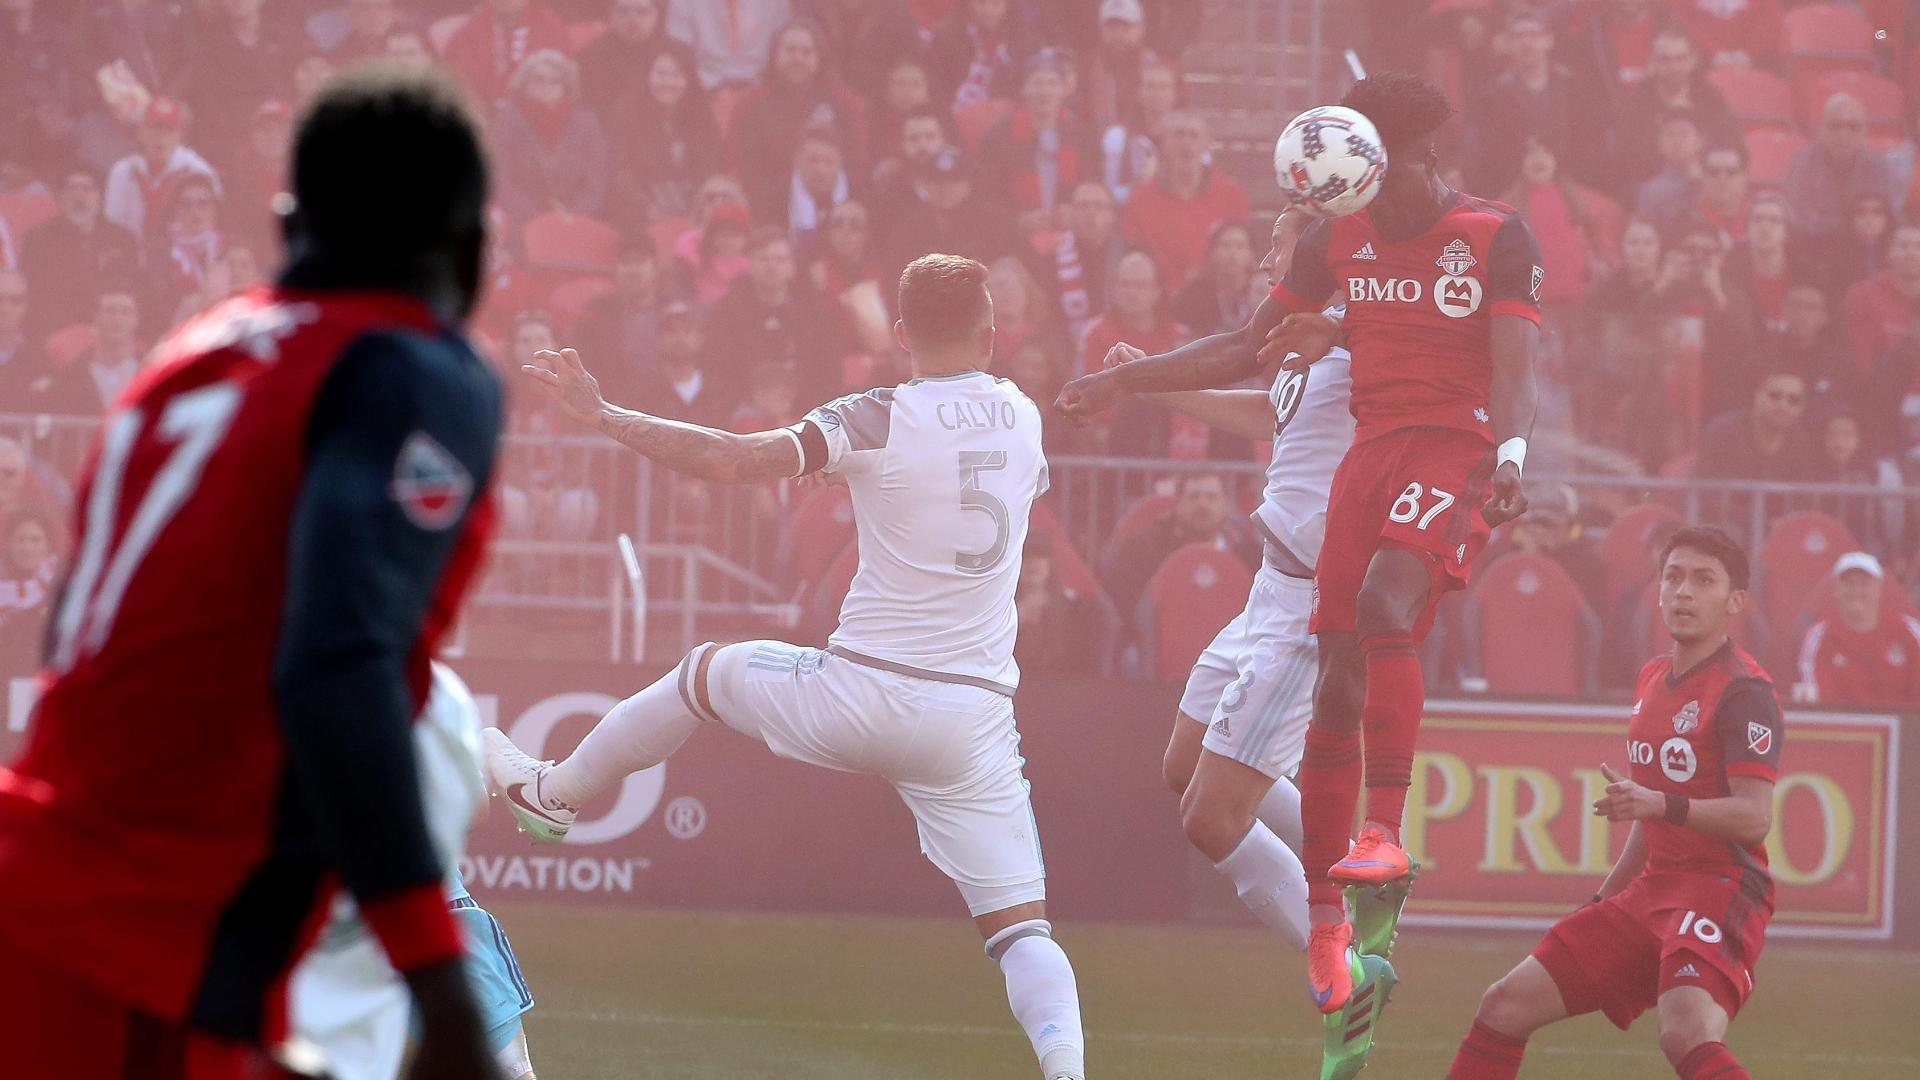 Toronto FC 3-2 Minnesota: Ricketts plays hero